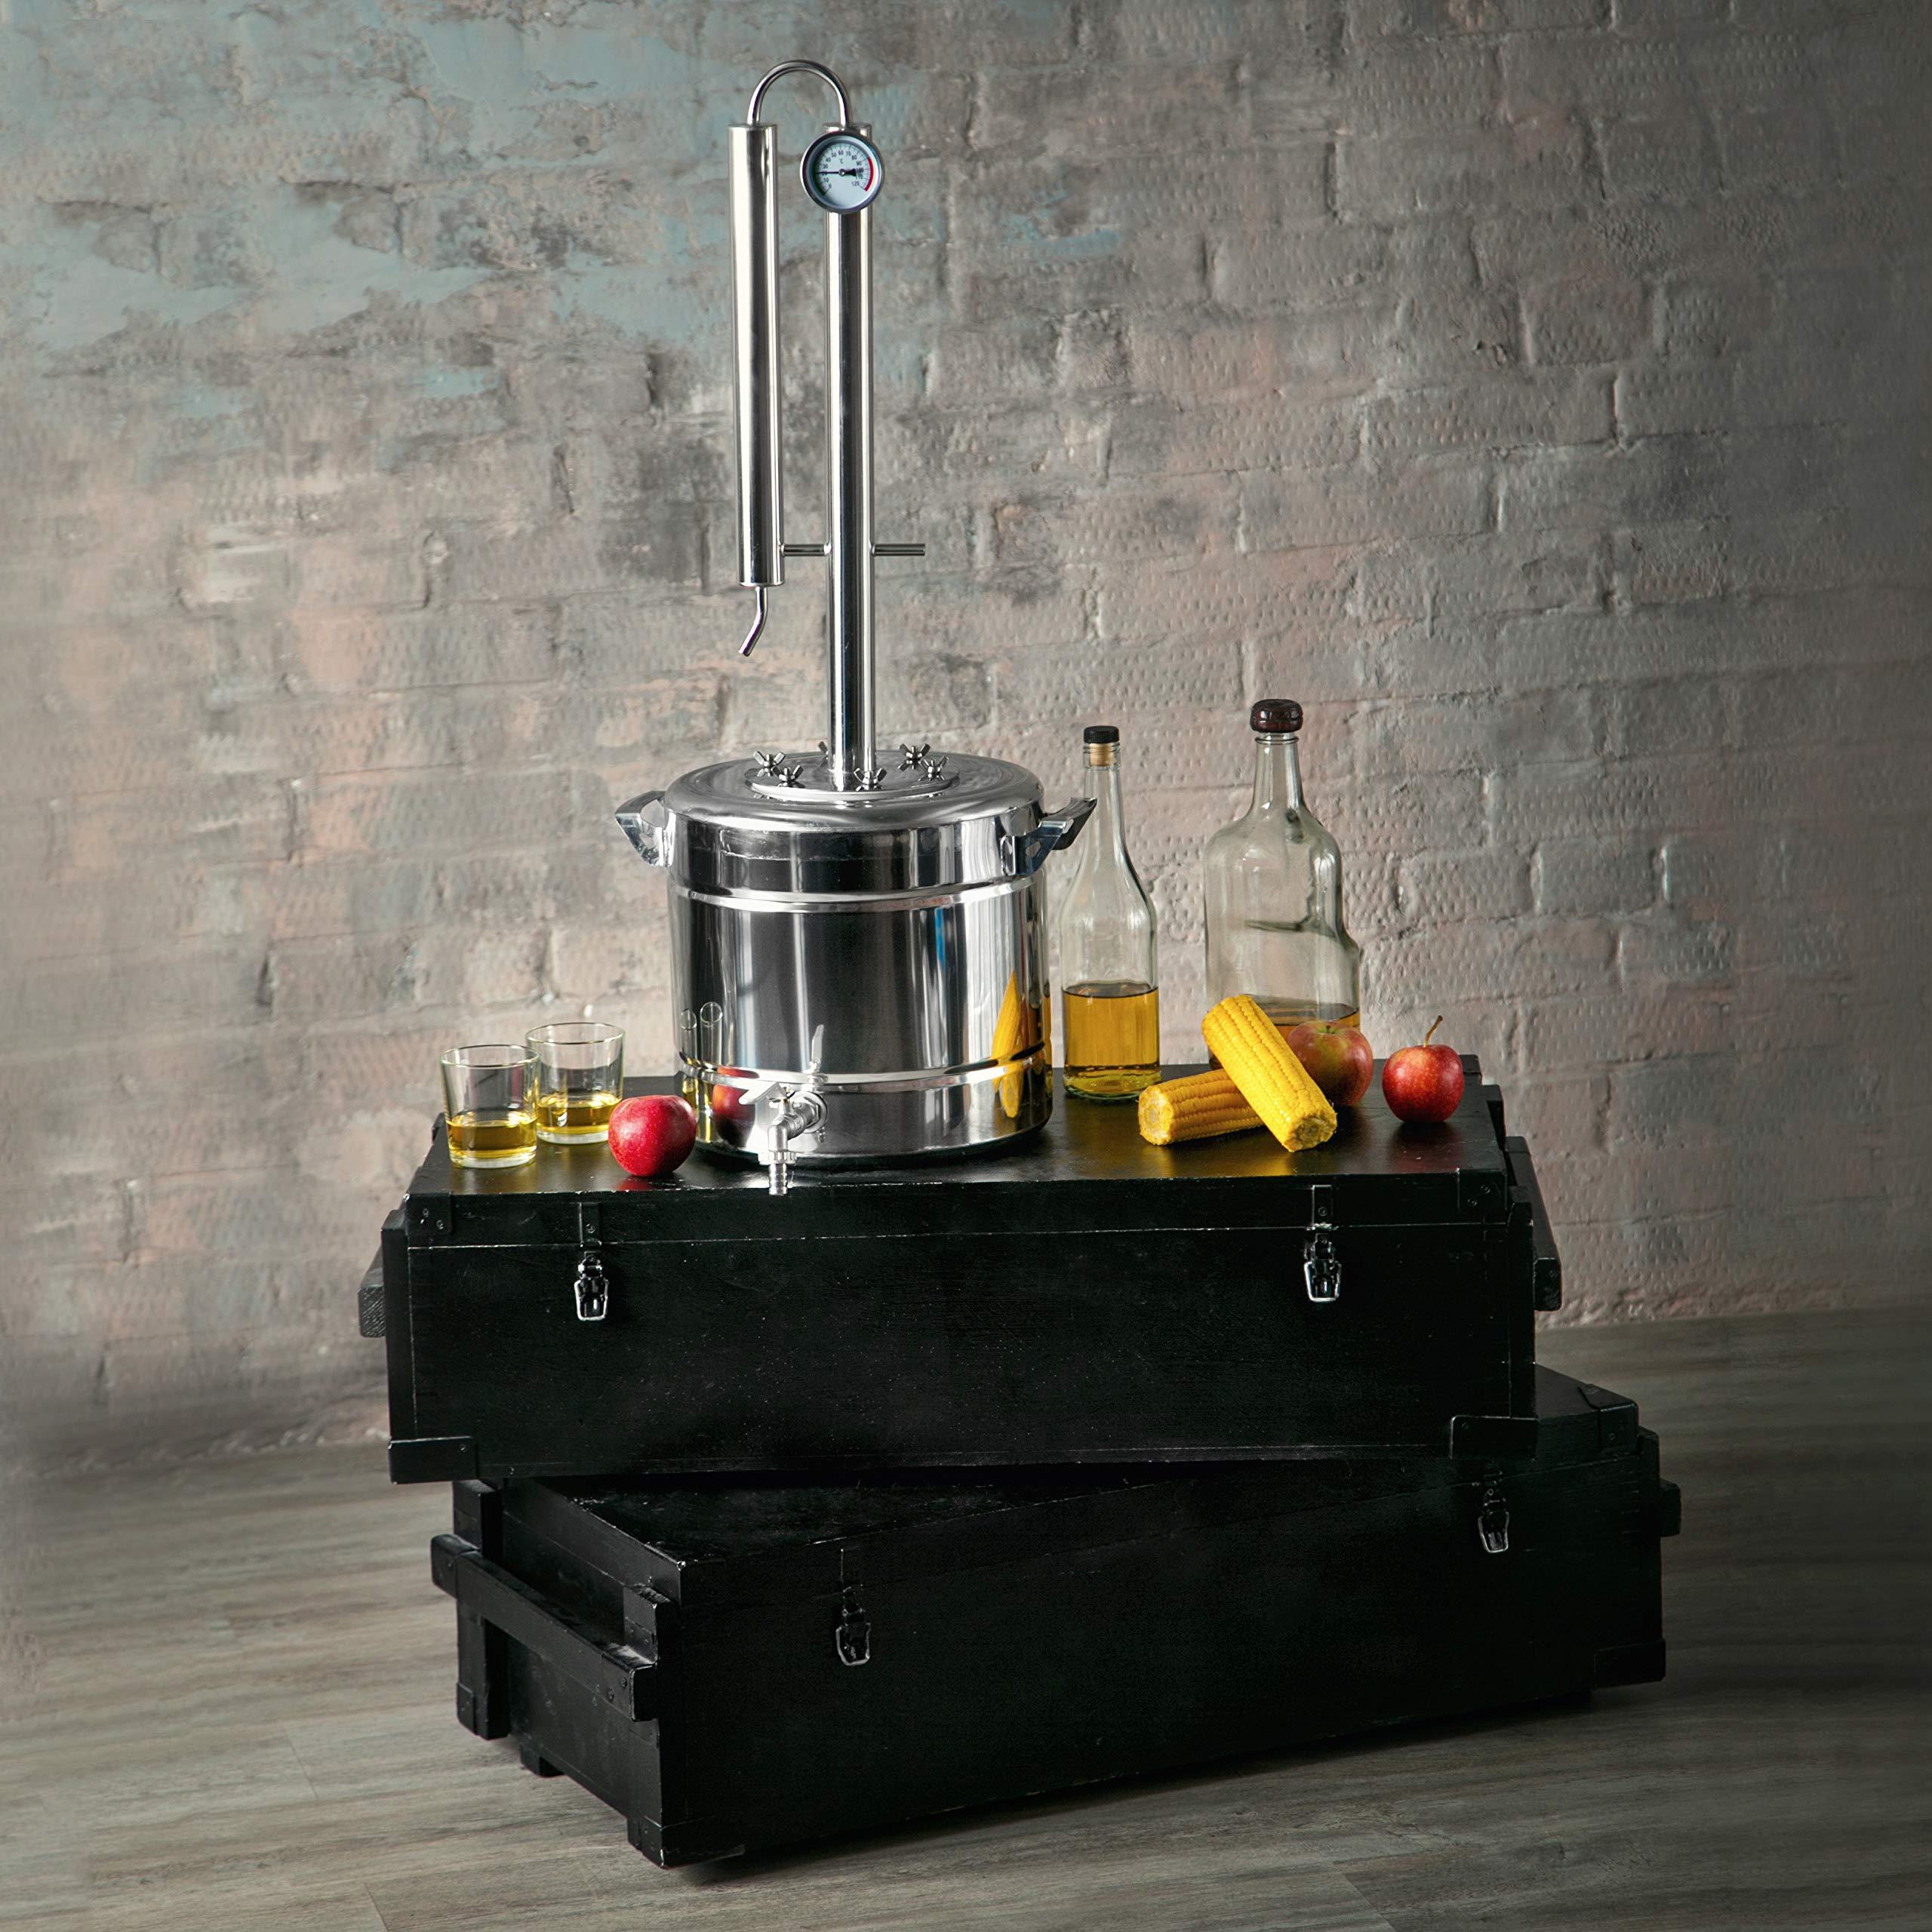 TANNOX Moonshine Still Kit Complete, Alcohol Distiller -Stainless Steel, Alcohol Still Spirits-Whiskey Making Kit - Liquor still 3Gal by TANNOX (Image #5)